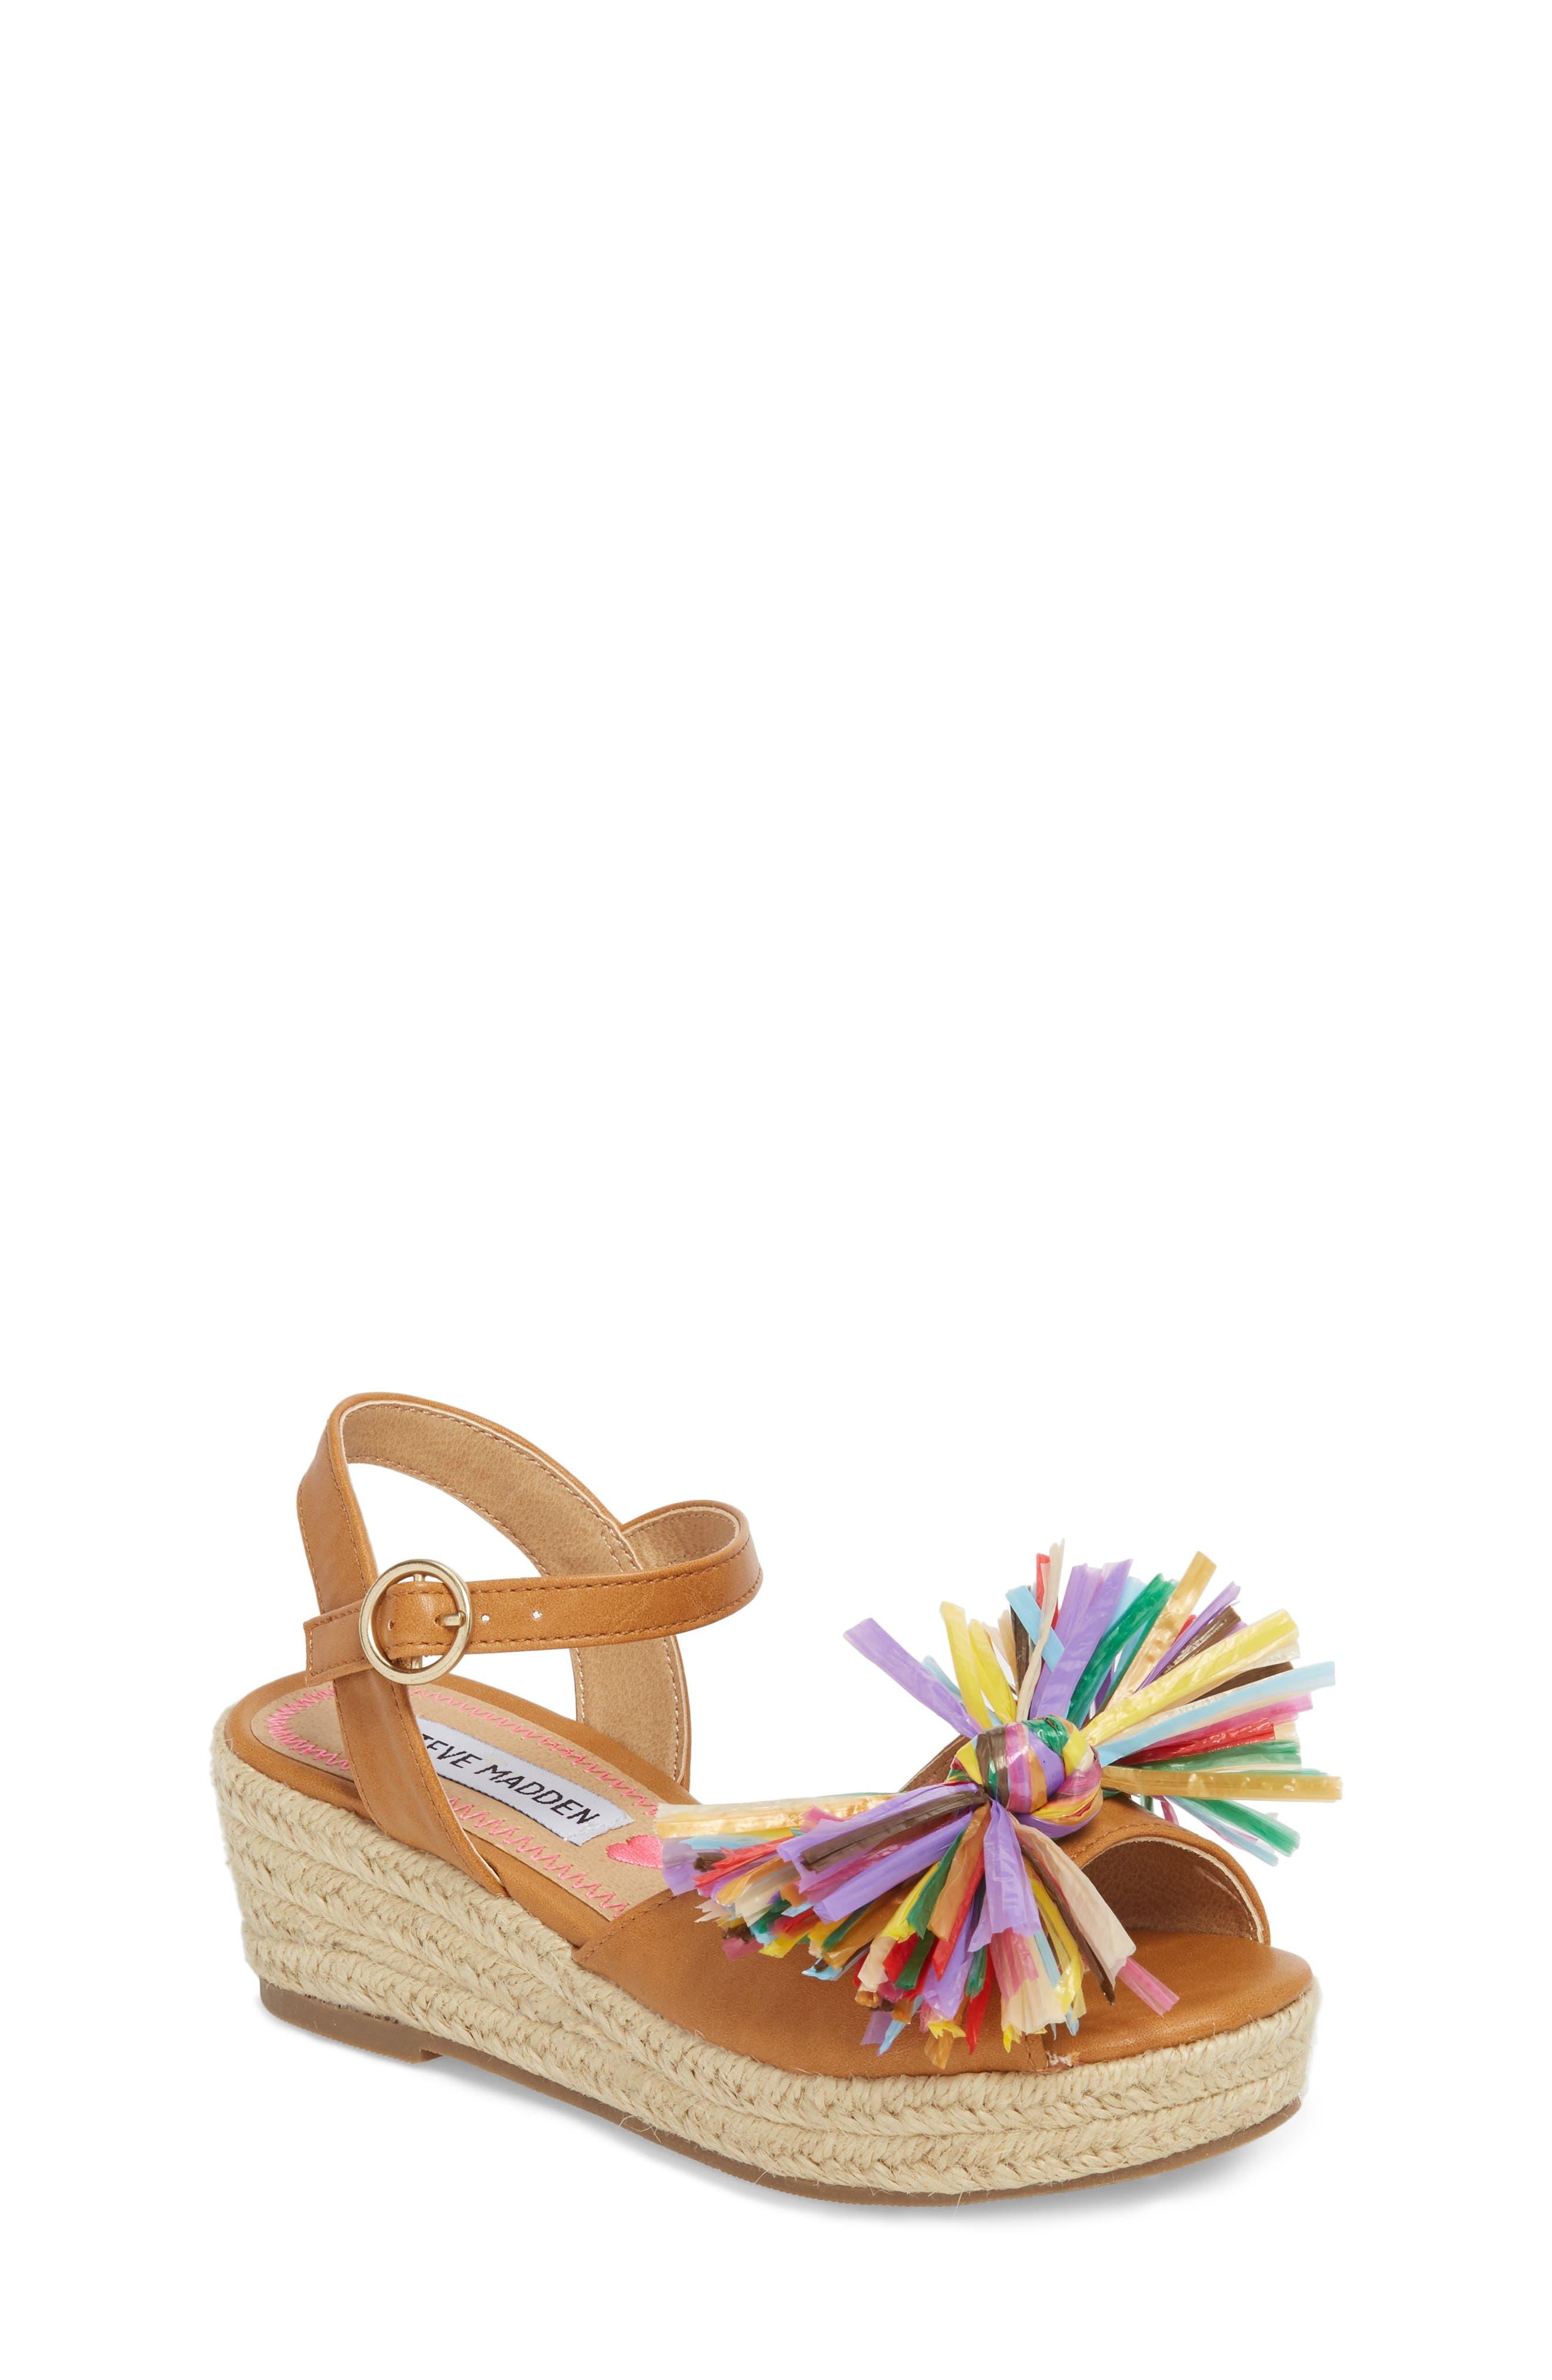 JSTRWBERI Wedge Sandal,                             Main thumbnail 1, color,                             Cognac Multi